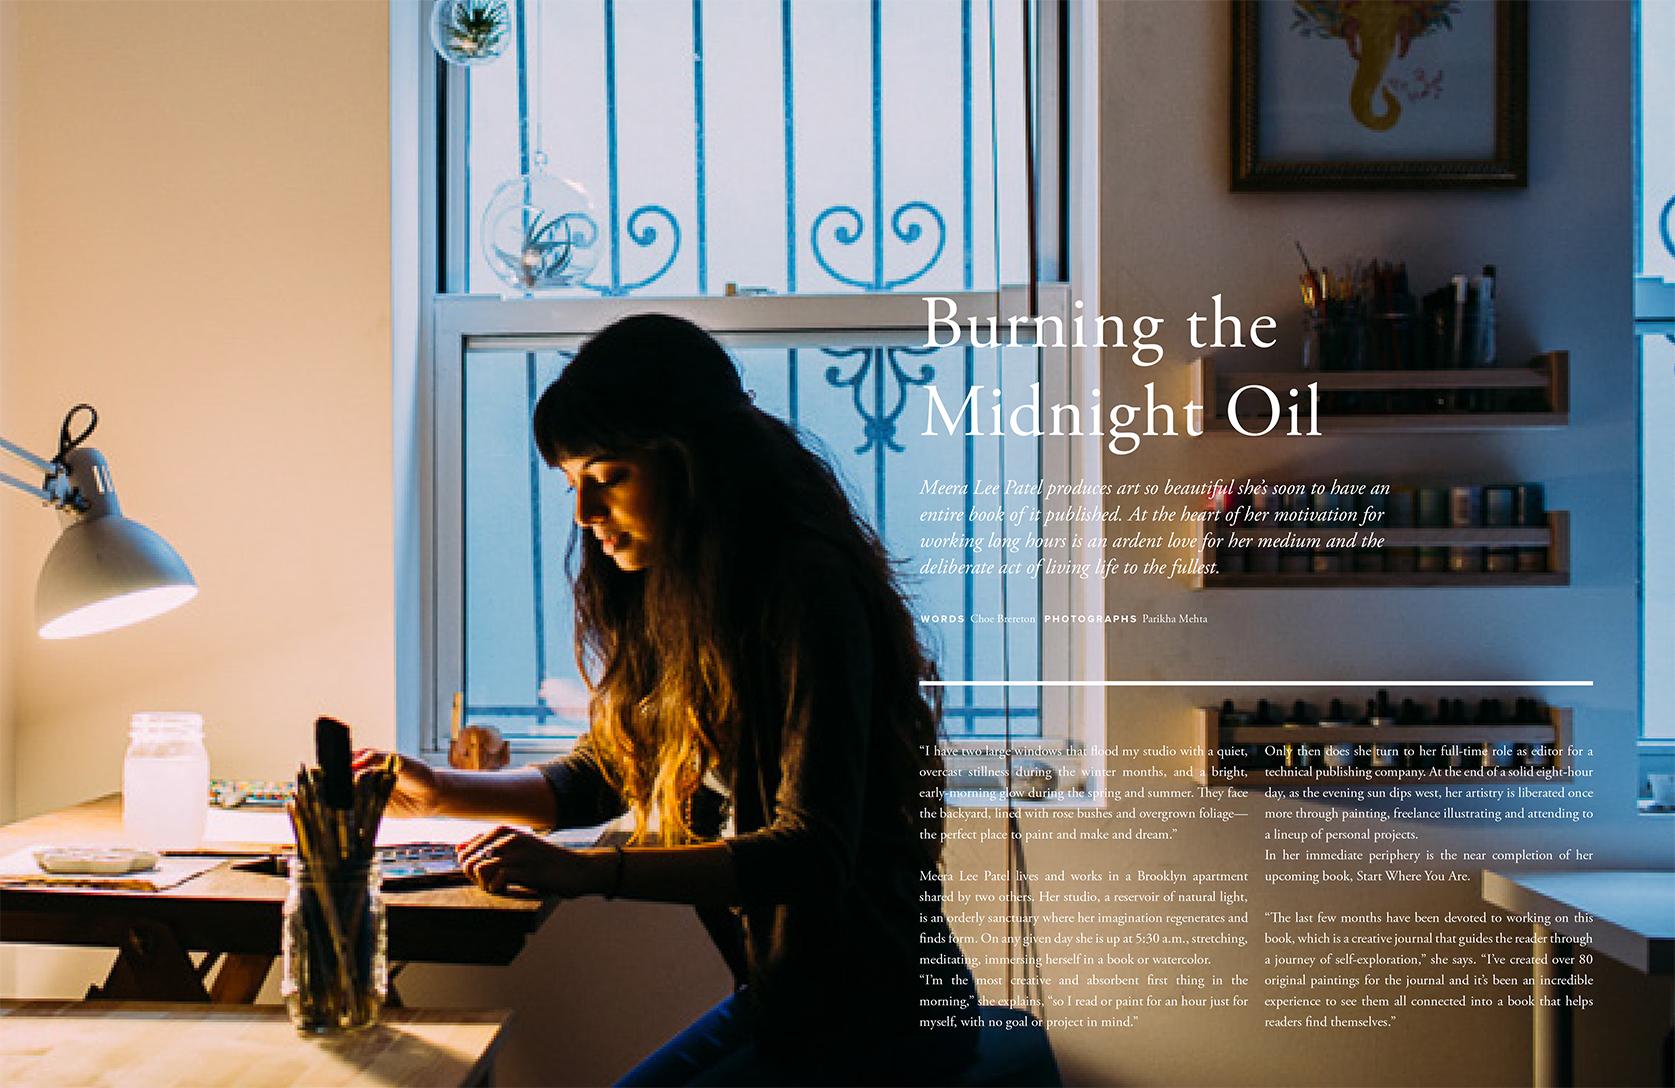 Meera Lee Patel for Trouve Magazine